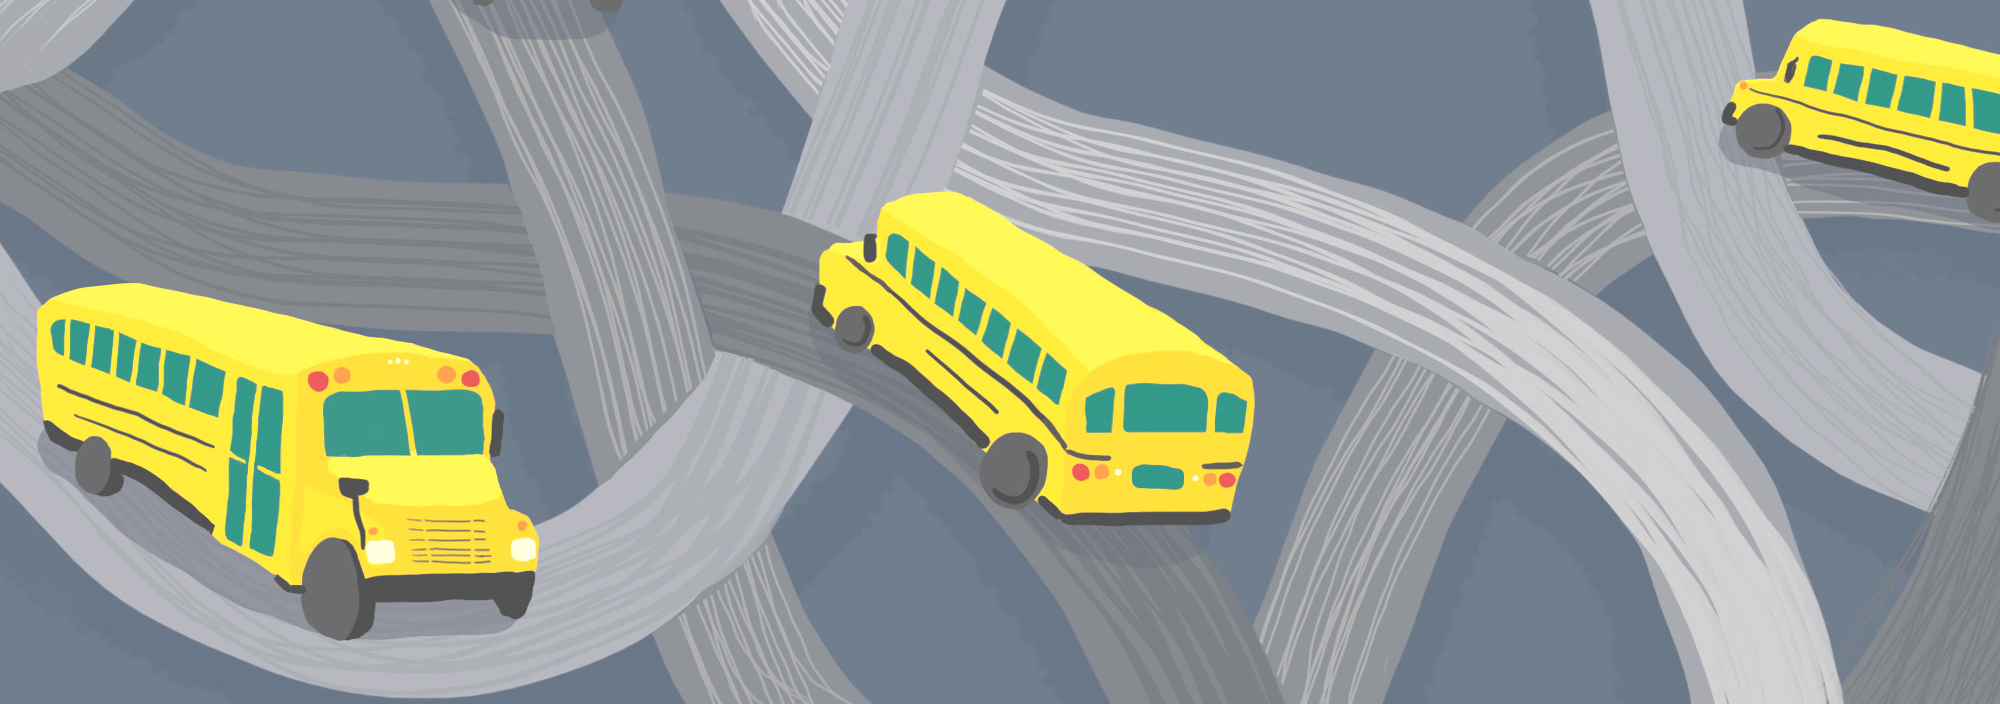 1425540583 busing illustration 3.jpg